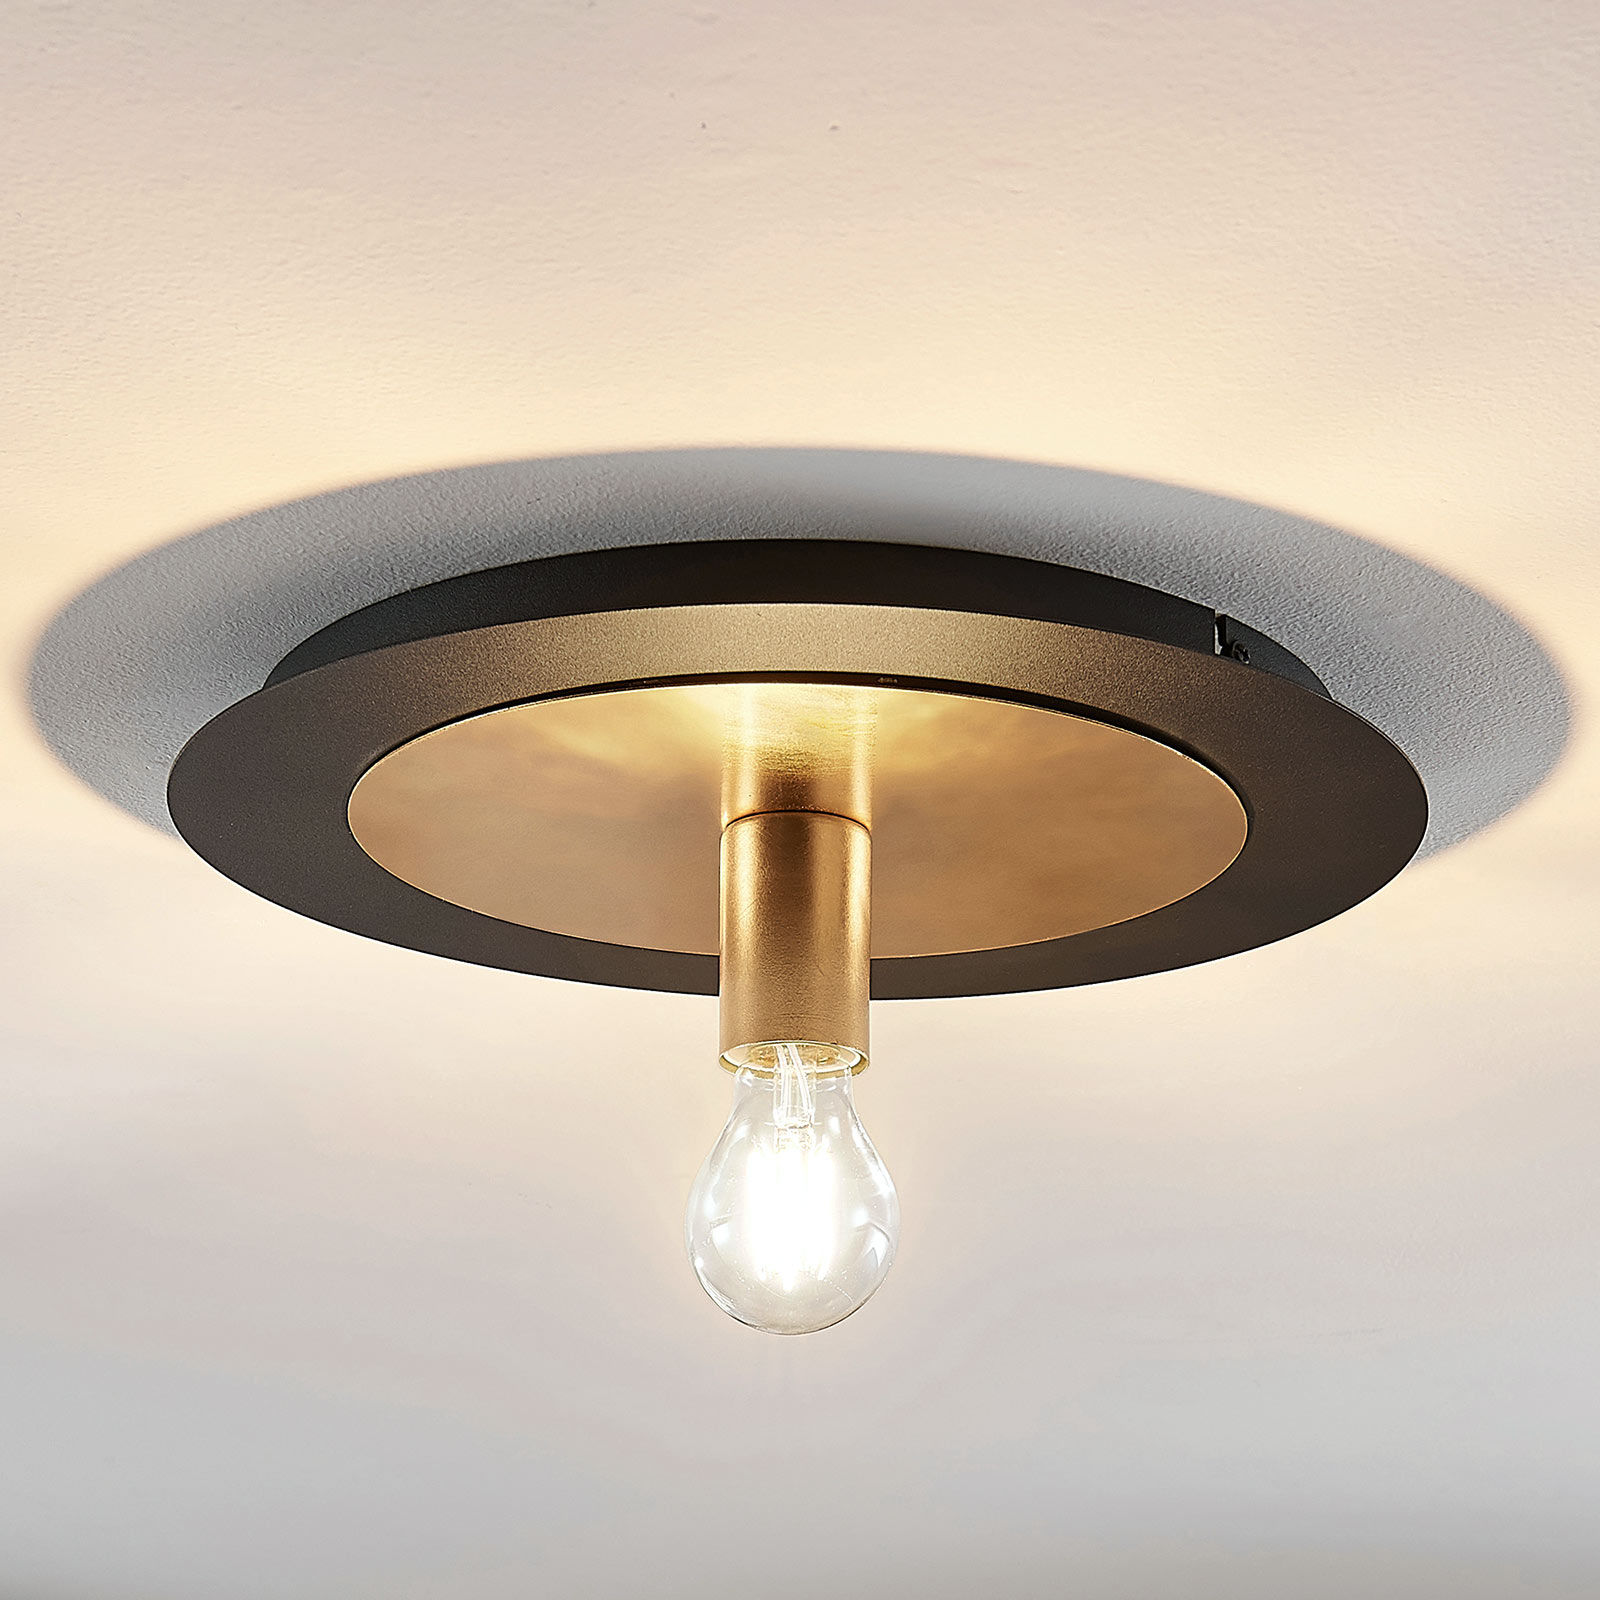 Metalowa lampa sufitowa Justik, 1-punktowa, czarna